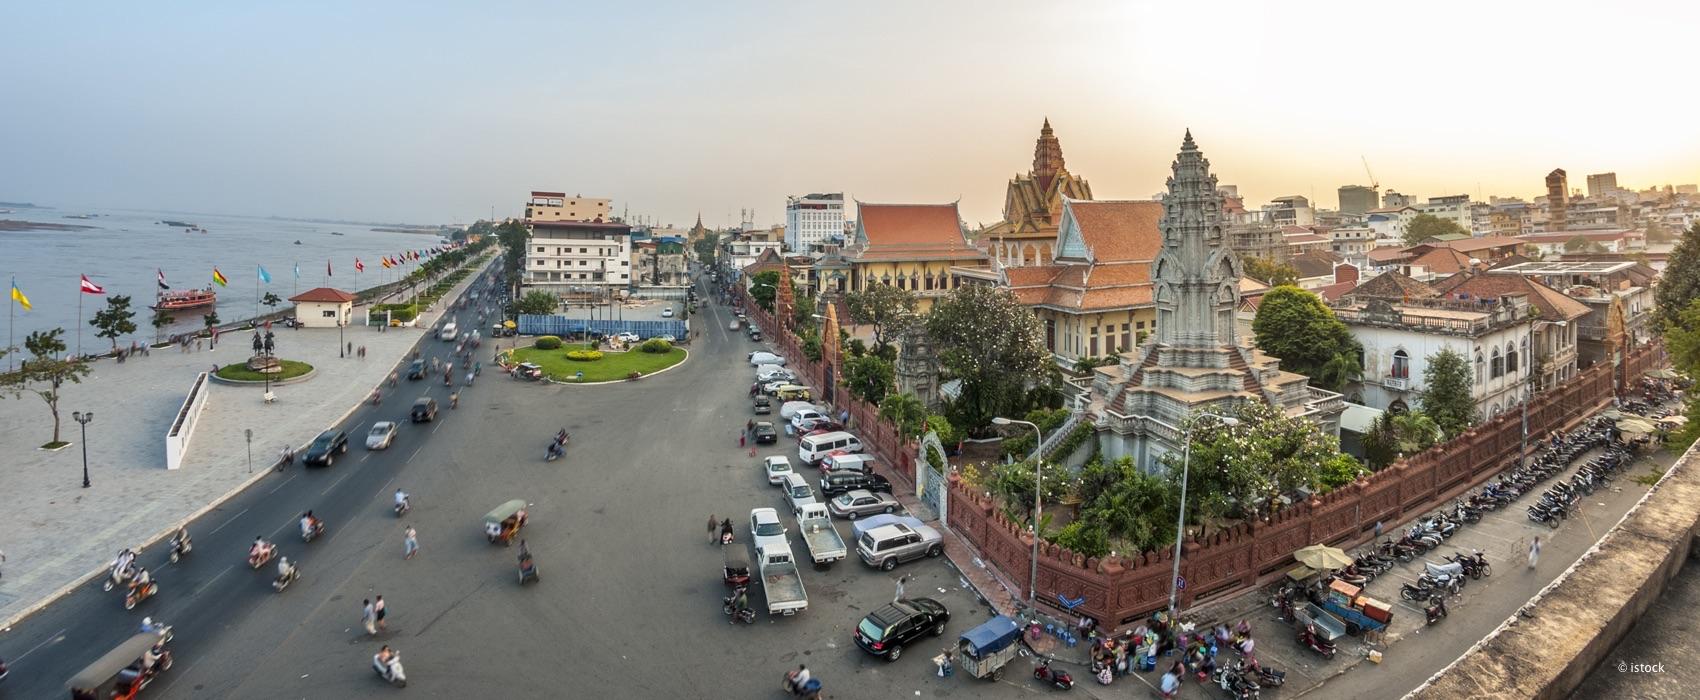 Impression aus Phnom Penh, Kambodscha